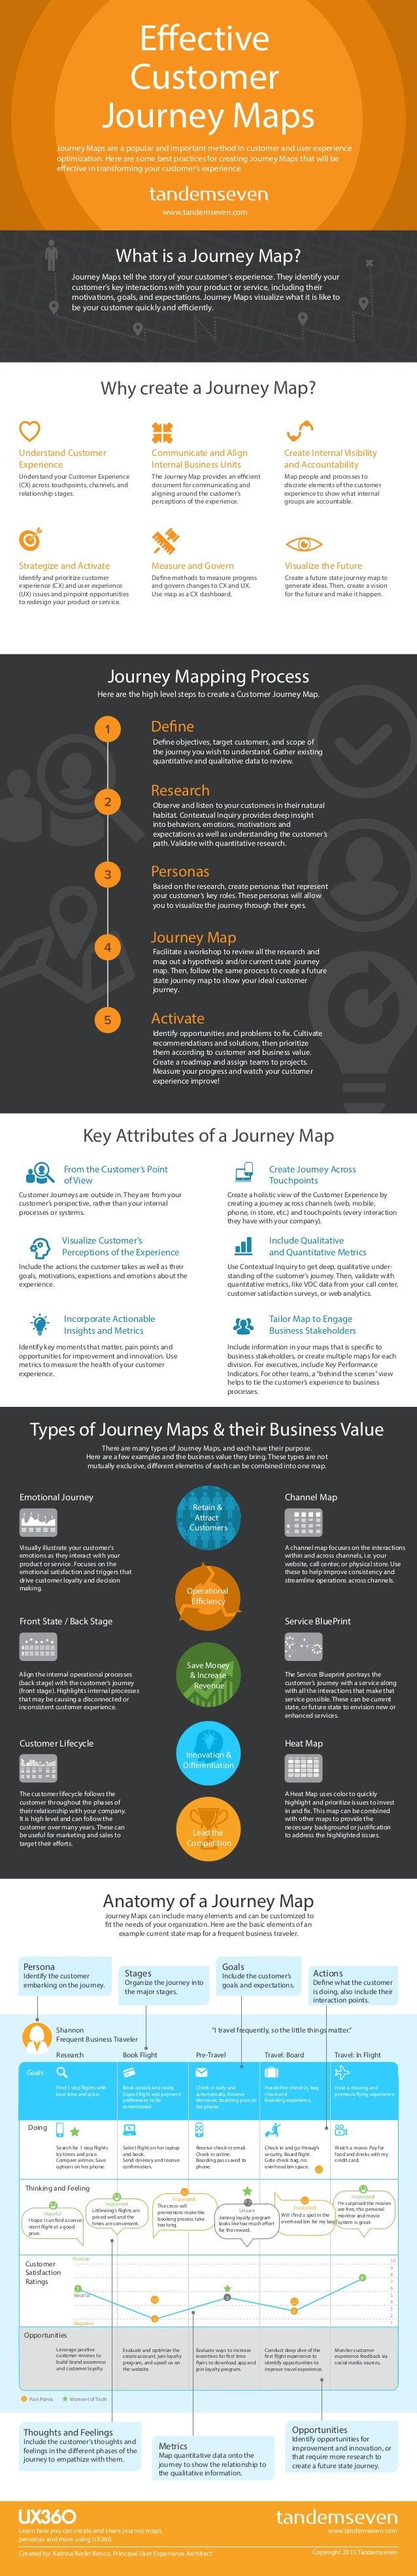 Effective Customer Journey Maps